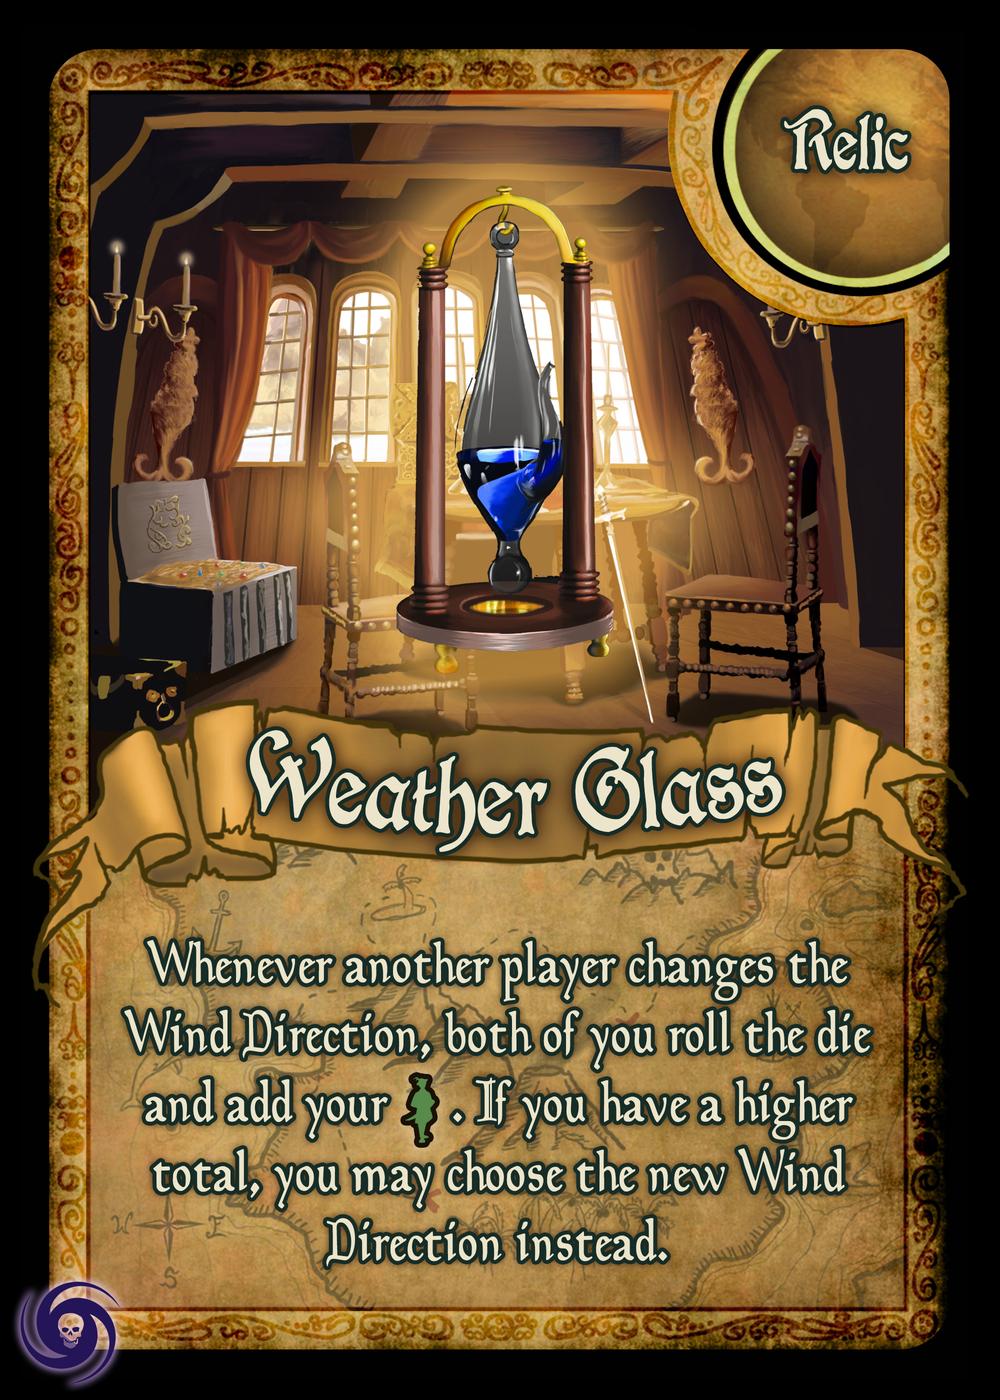 weather-glass.jpg